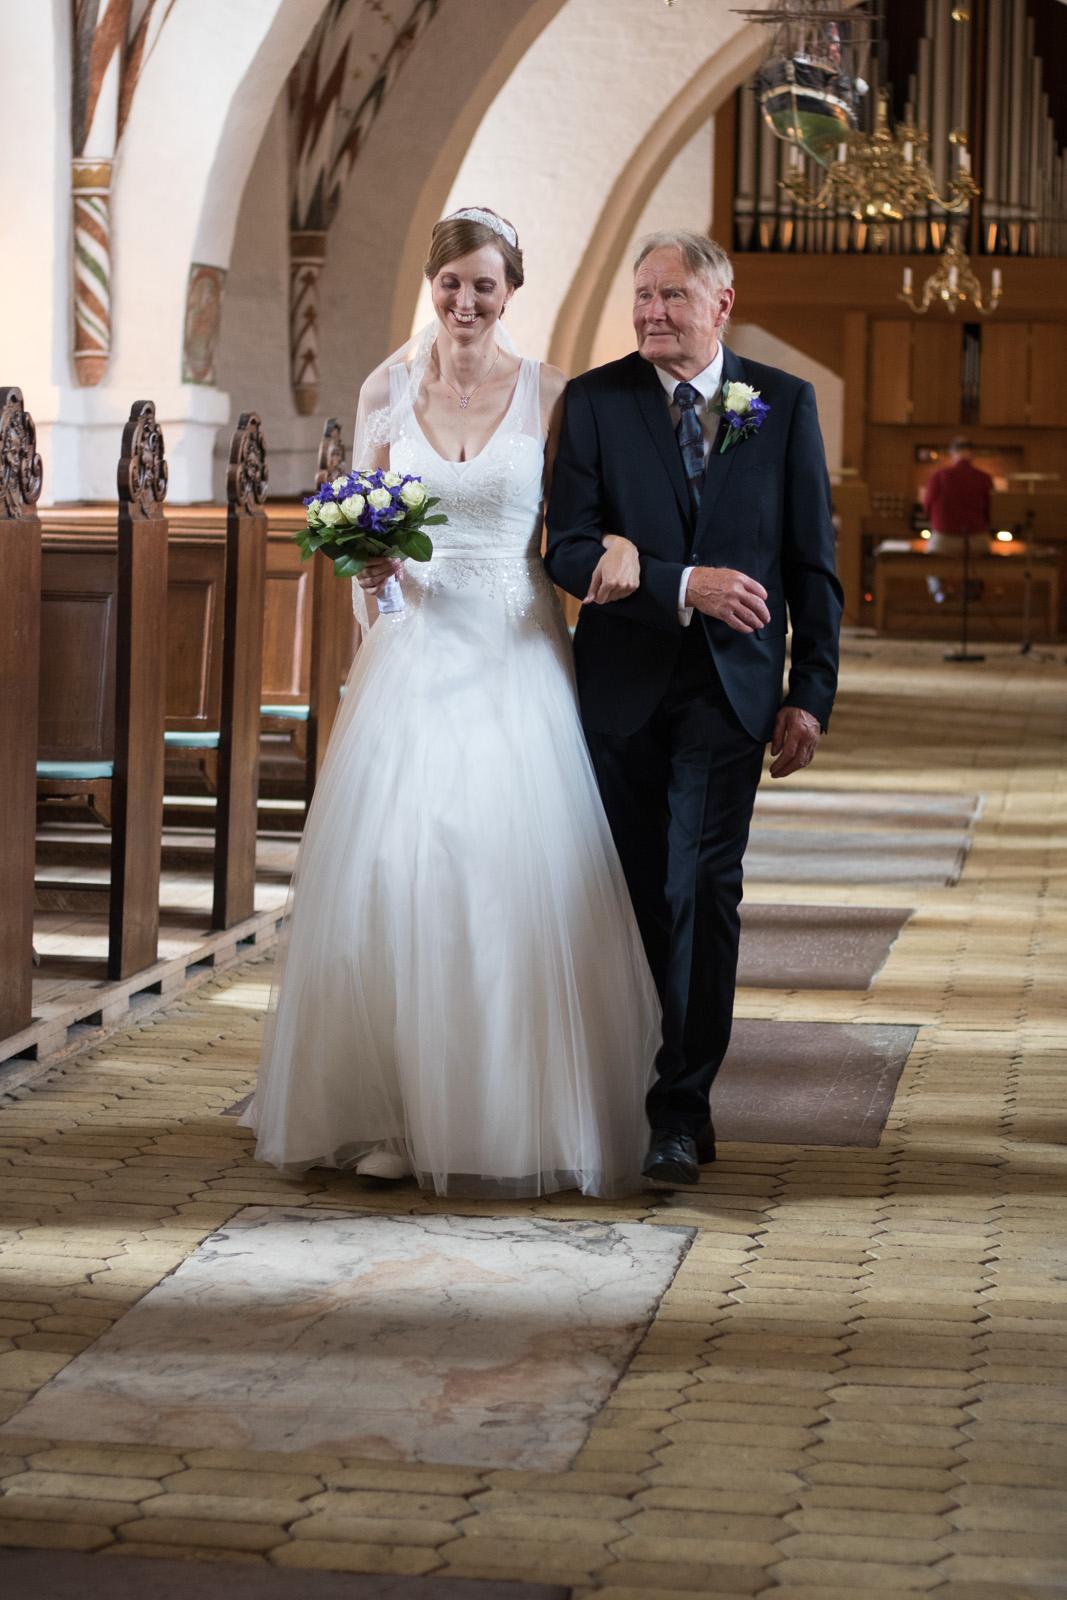 Tine og Allans bryllup - op ad kirkegulvet